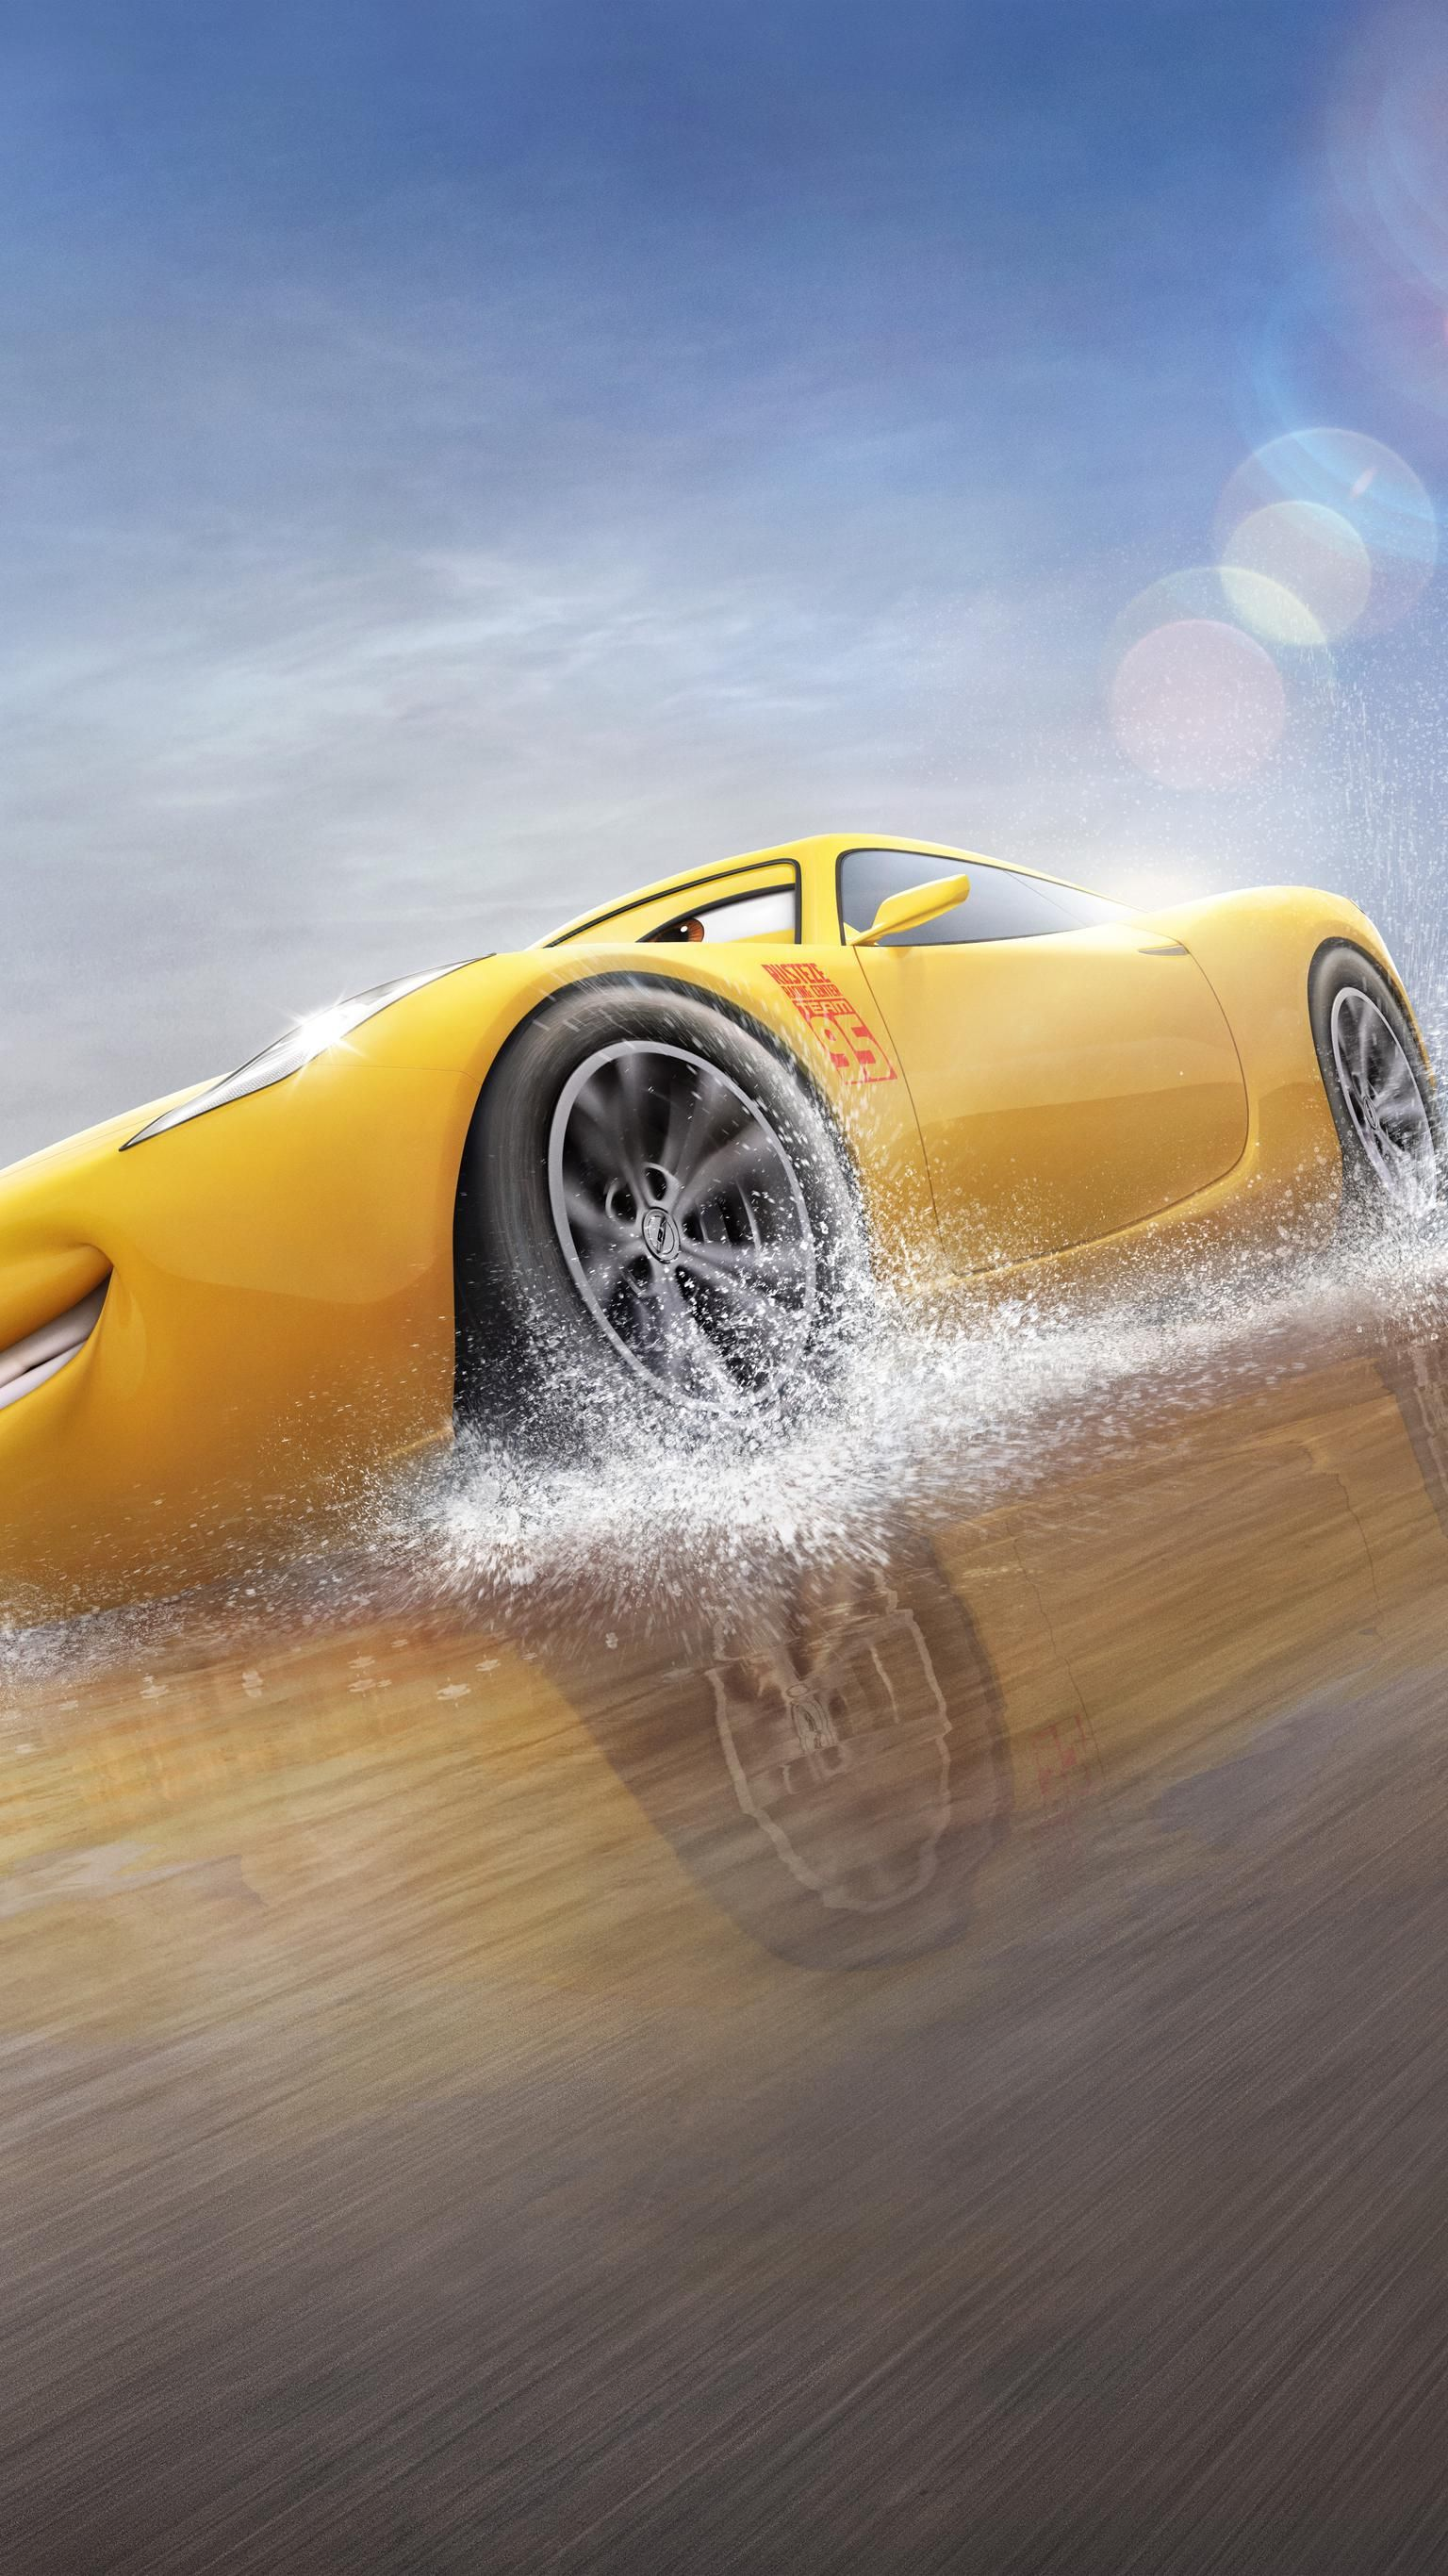 Cars 3 2017 Phone Wallpaper Moviemania Disney Cars Wallpaper Cruz Ramirez Disney Cars [ 2732 x 1536 Pixel ]